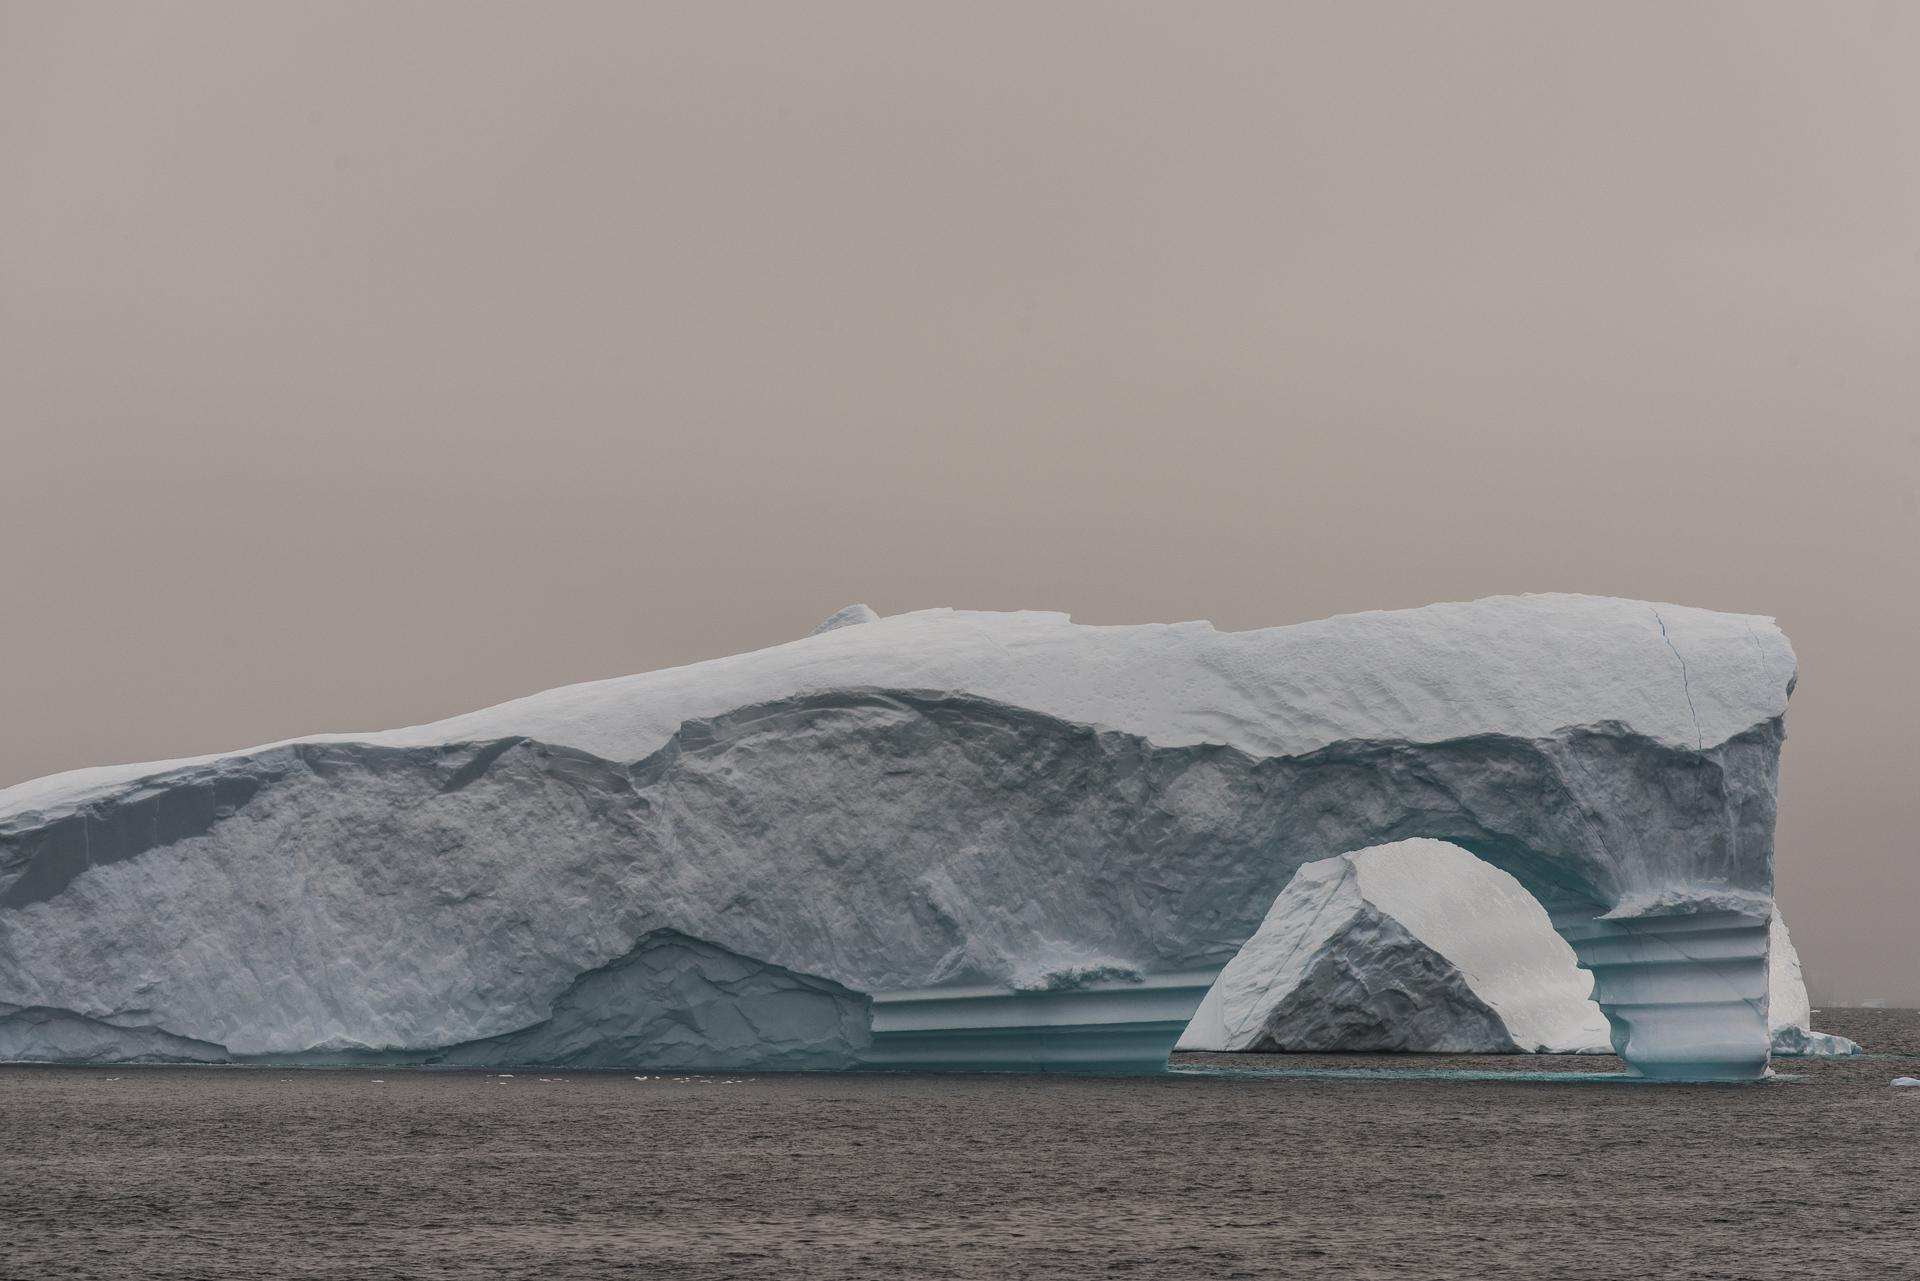 28.Defibaugh_Greenland_Uummannaq_a_102.jpg